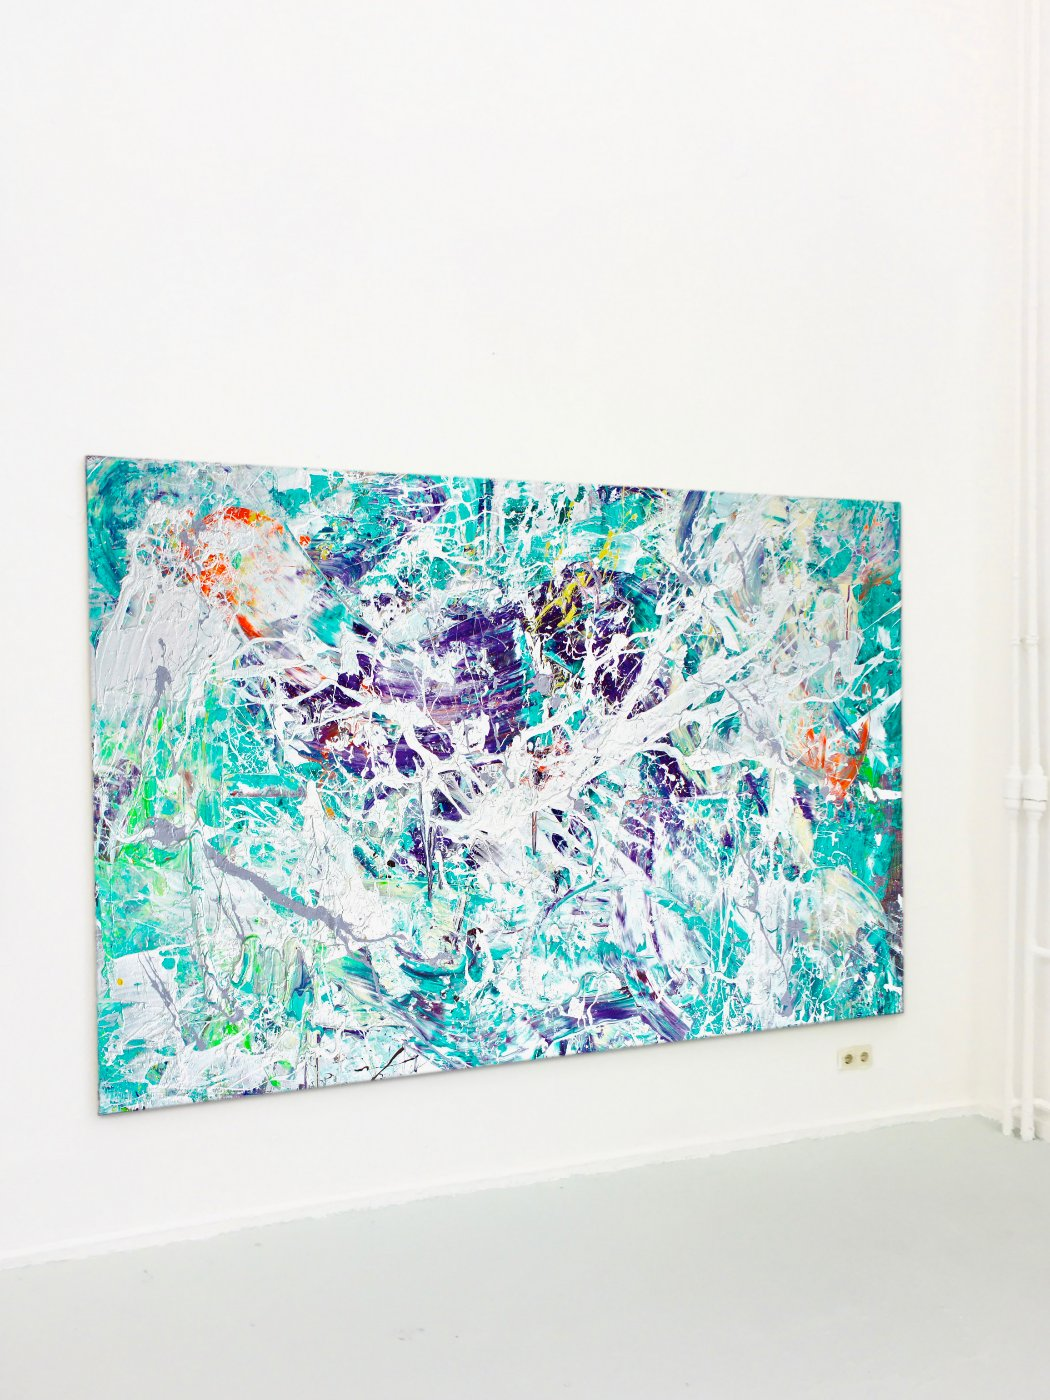 Kunstakademie Düsseldorf Artist Theresa Kallrath Abstrakt Kunst Art